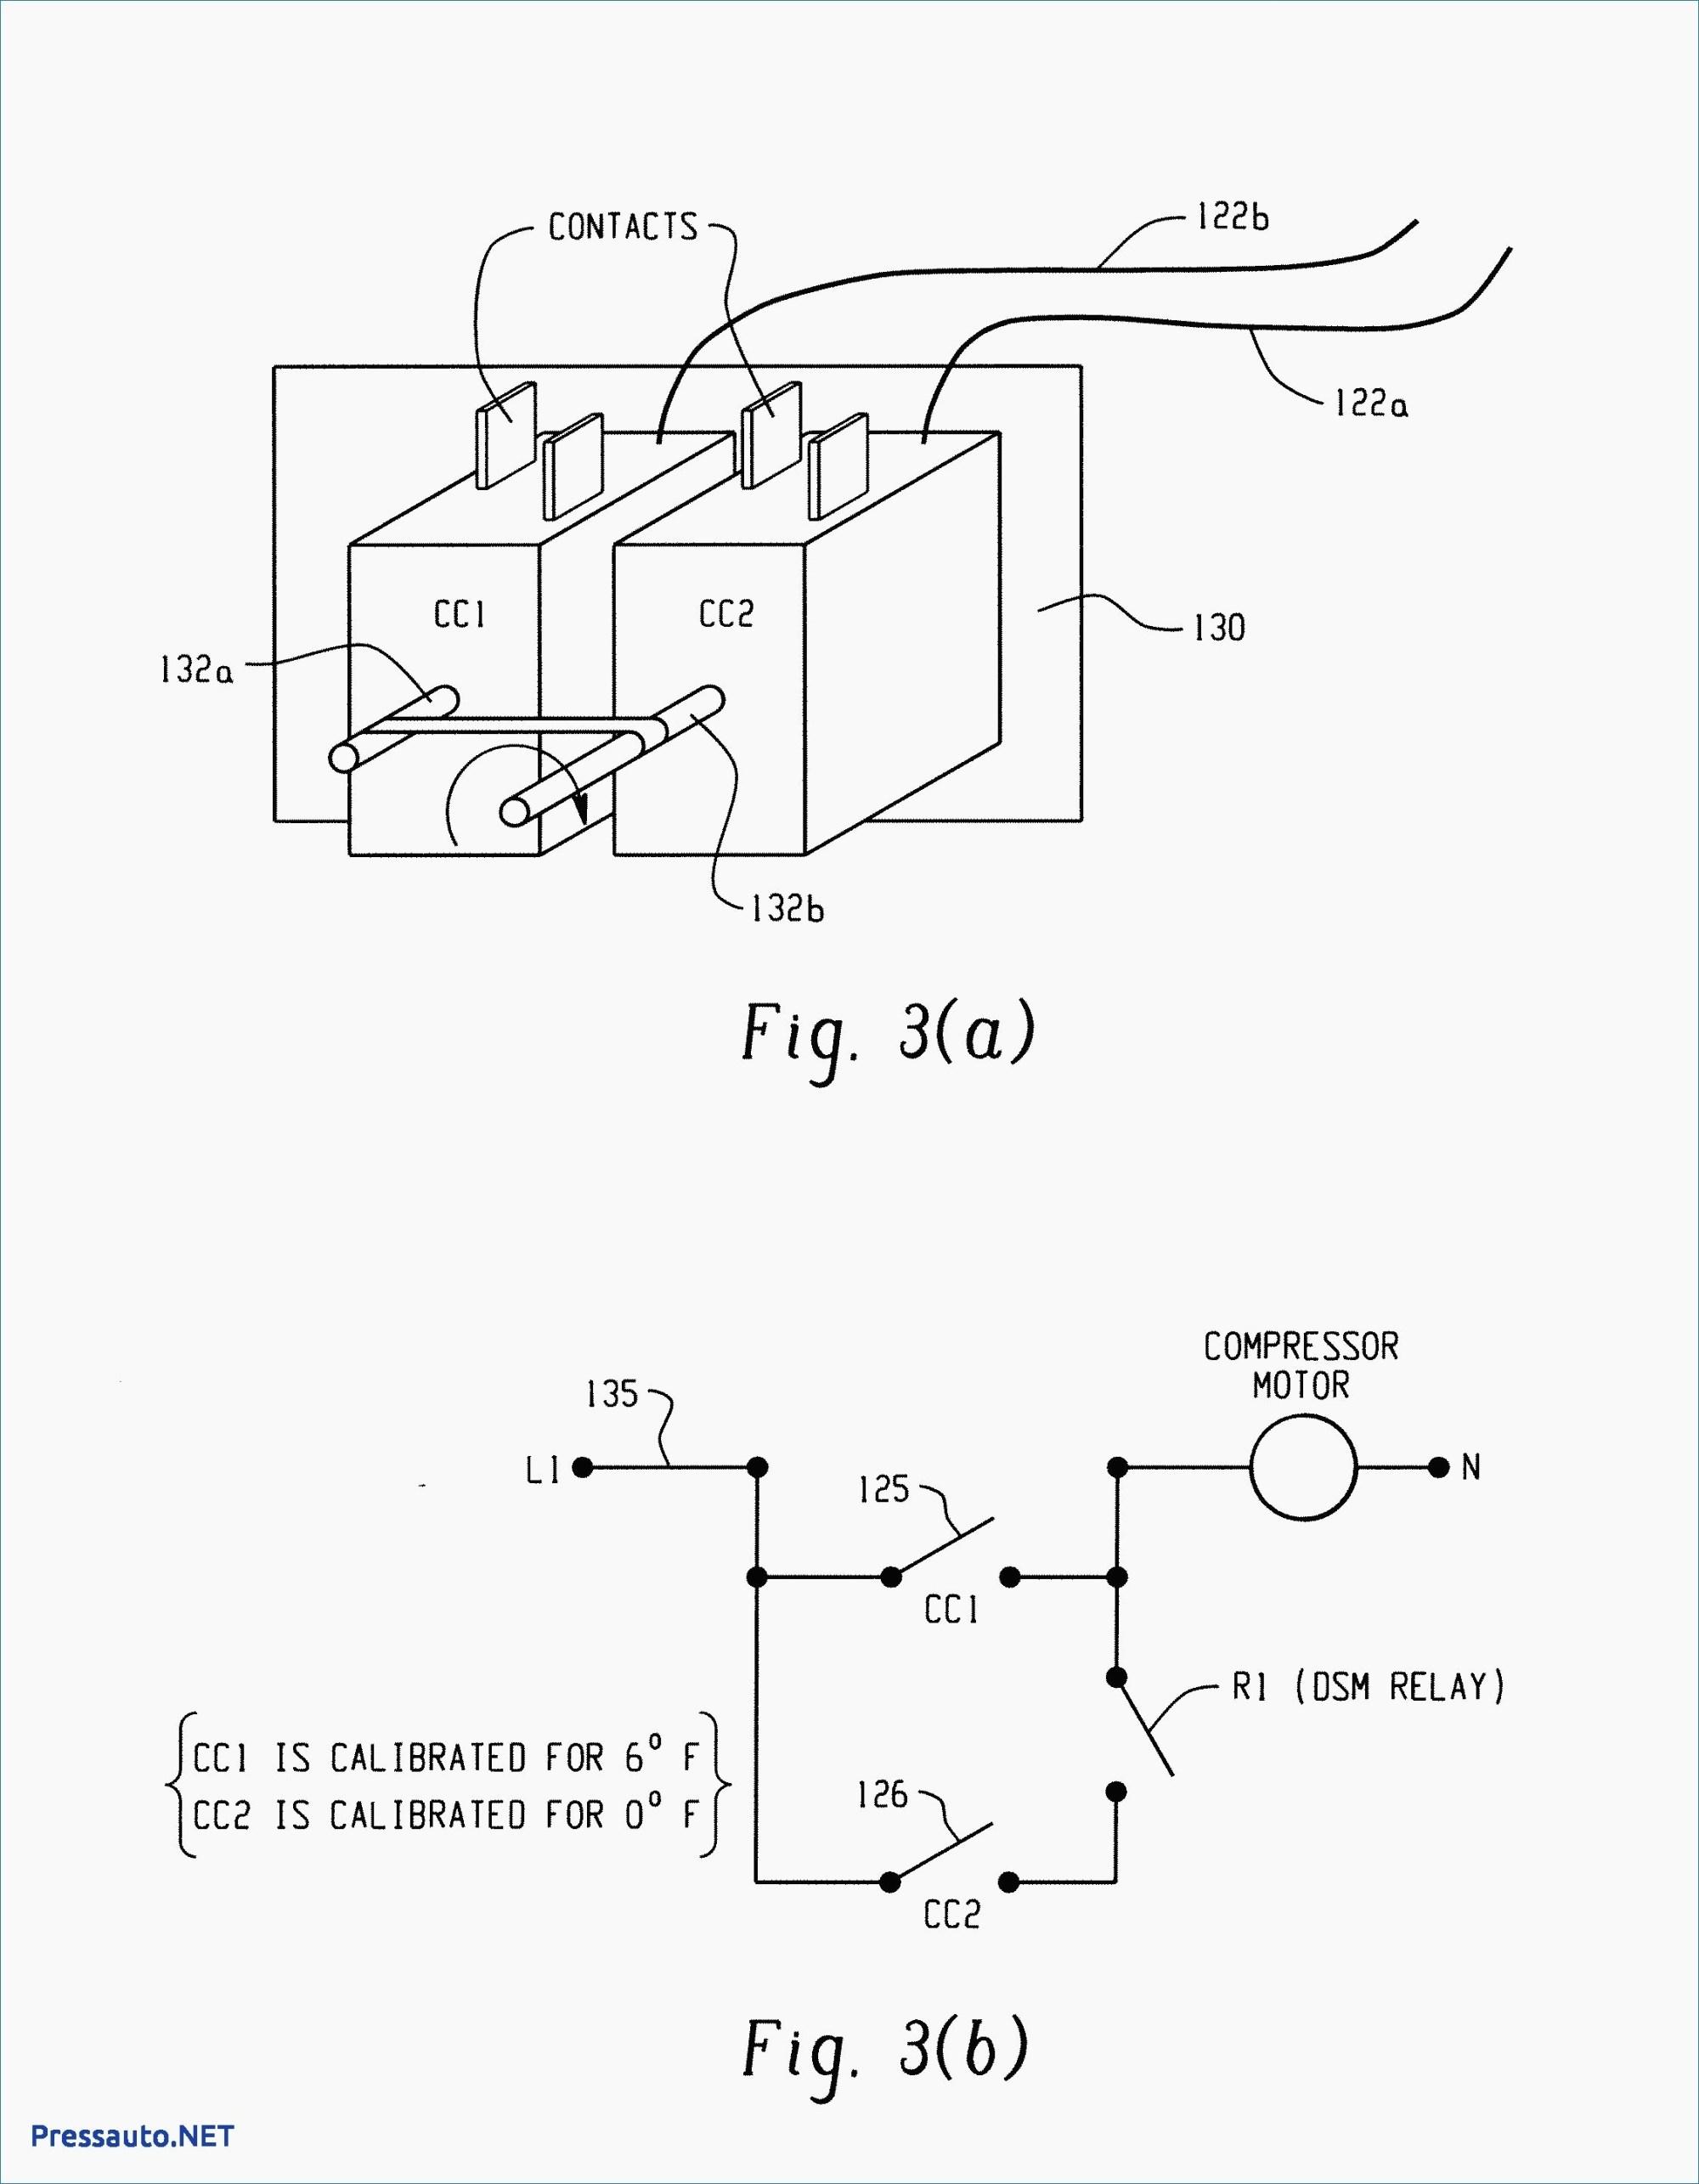 hight resolution of 3 wire pressure transducer wiring diagram 3 wire pressure transducer wiring diagram luxury series 2